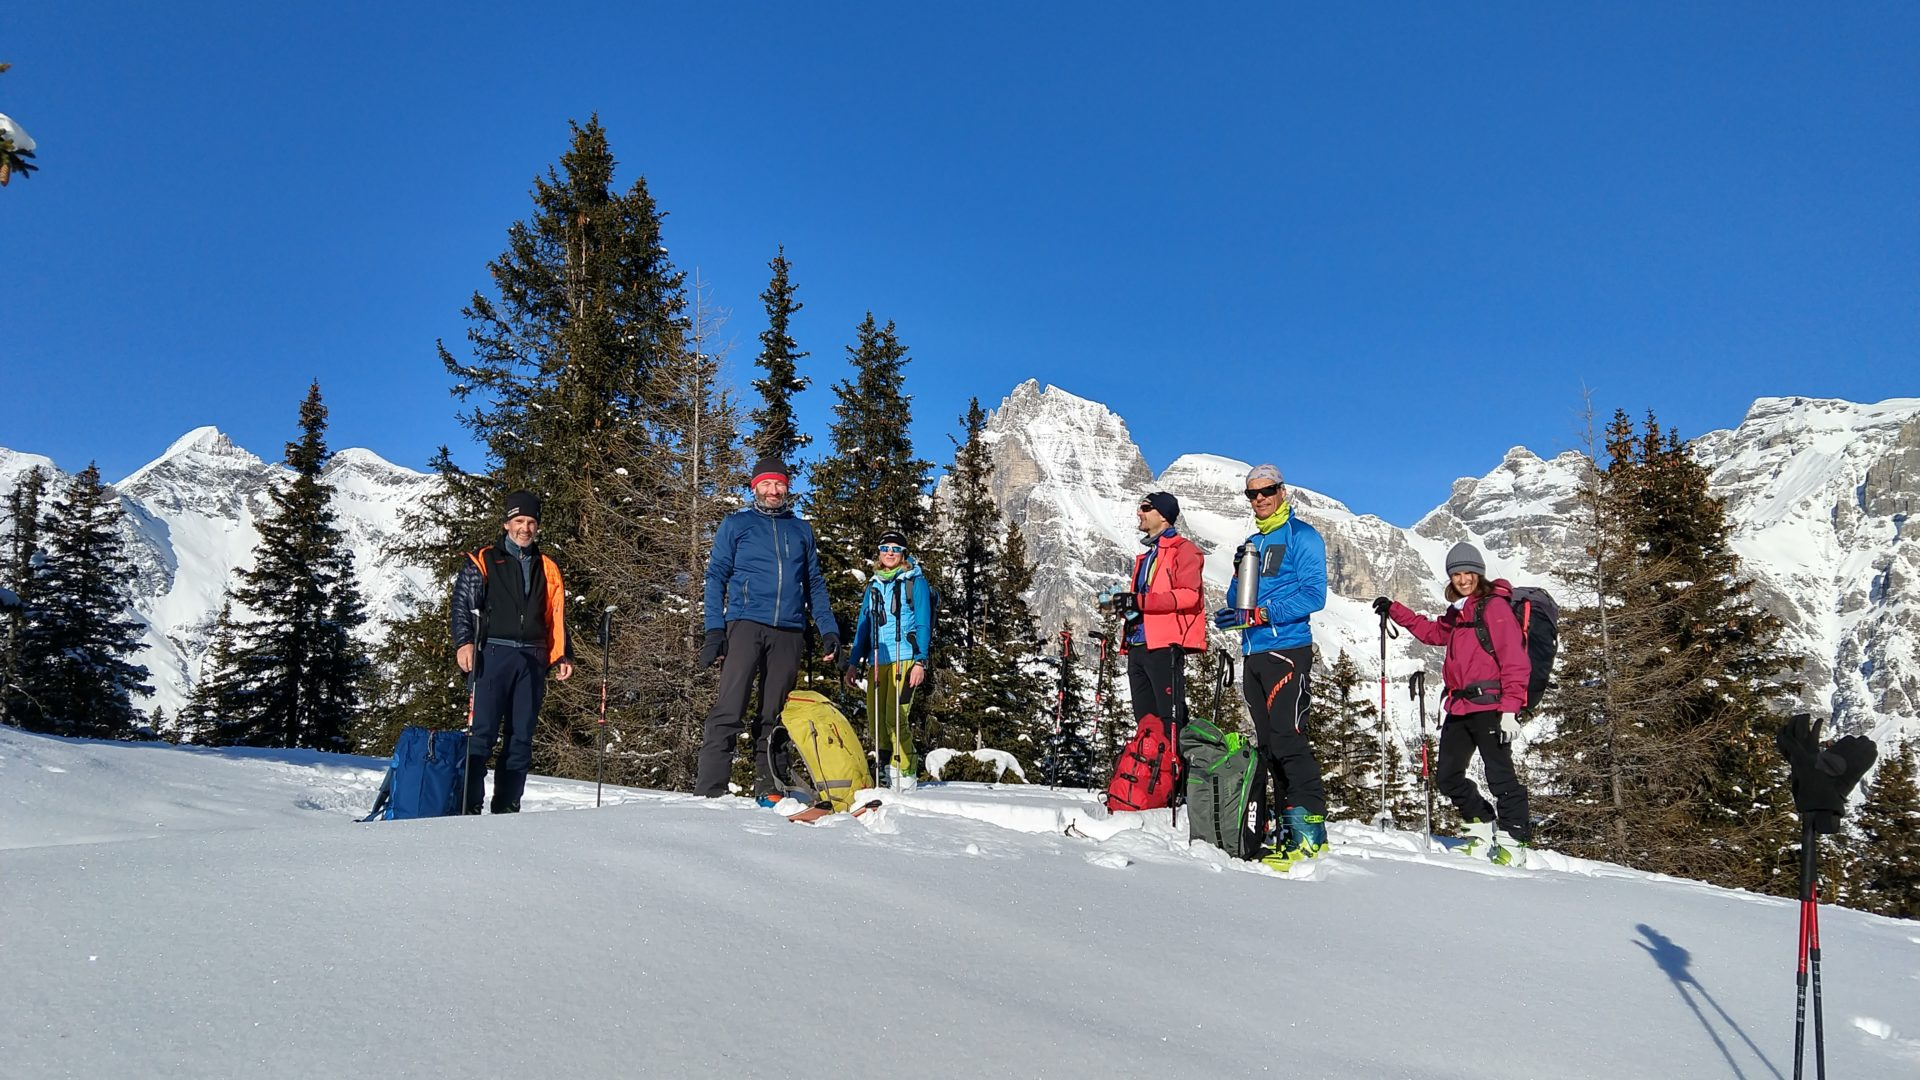 Tourenleiterweiterbildung Skitour (c) Stephan Masoner